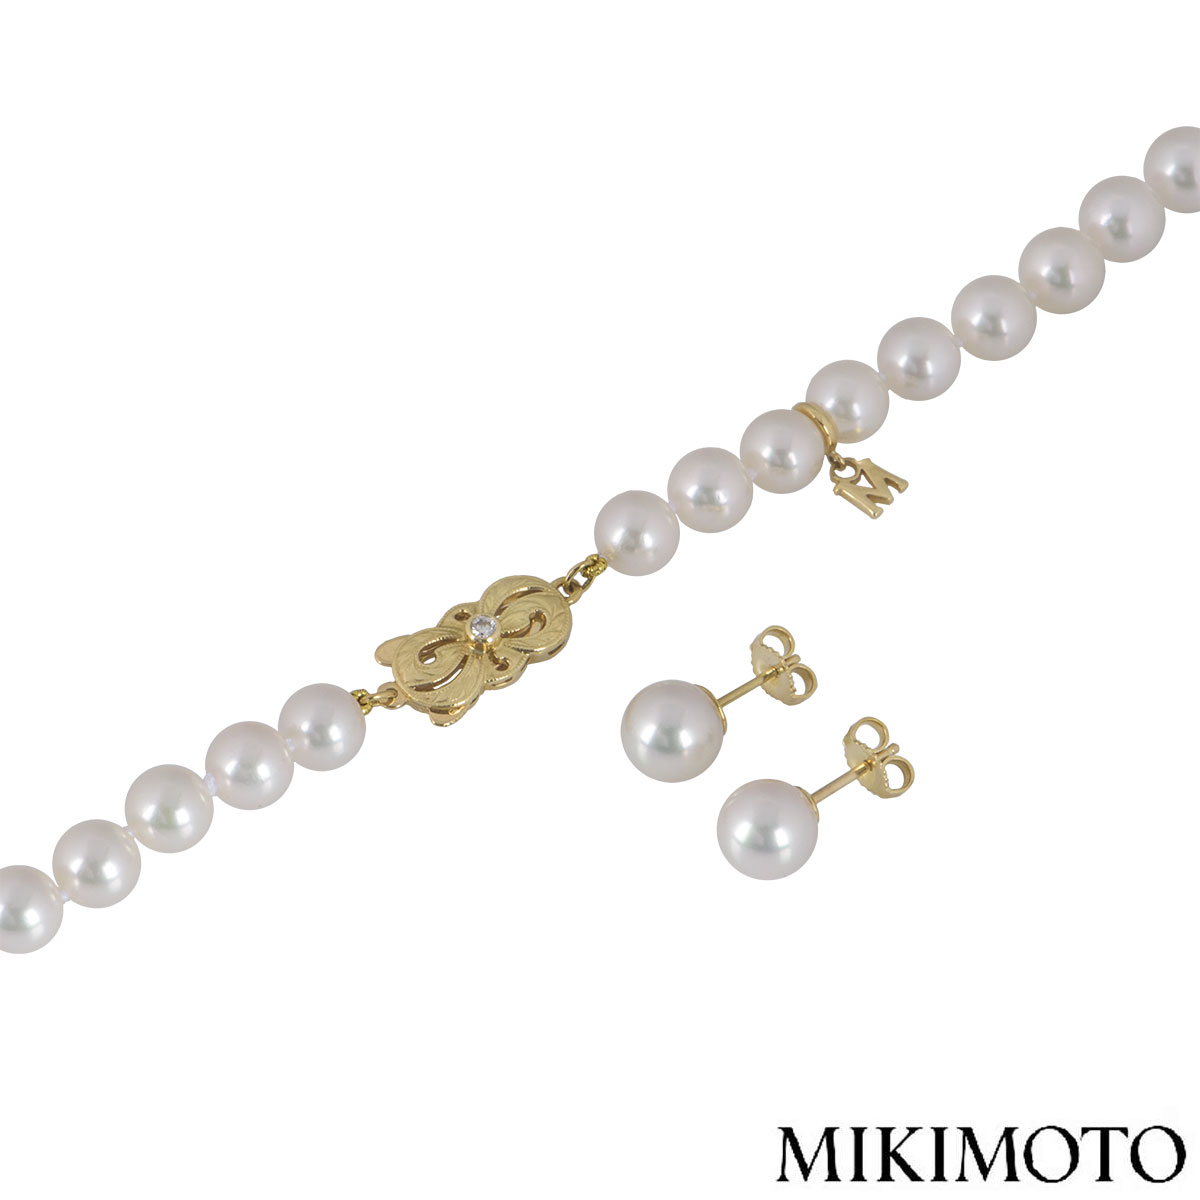 Mikimoto Yellow Gold Diamond & Pearl Suite